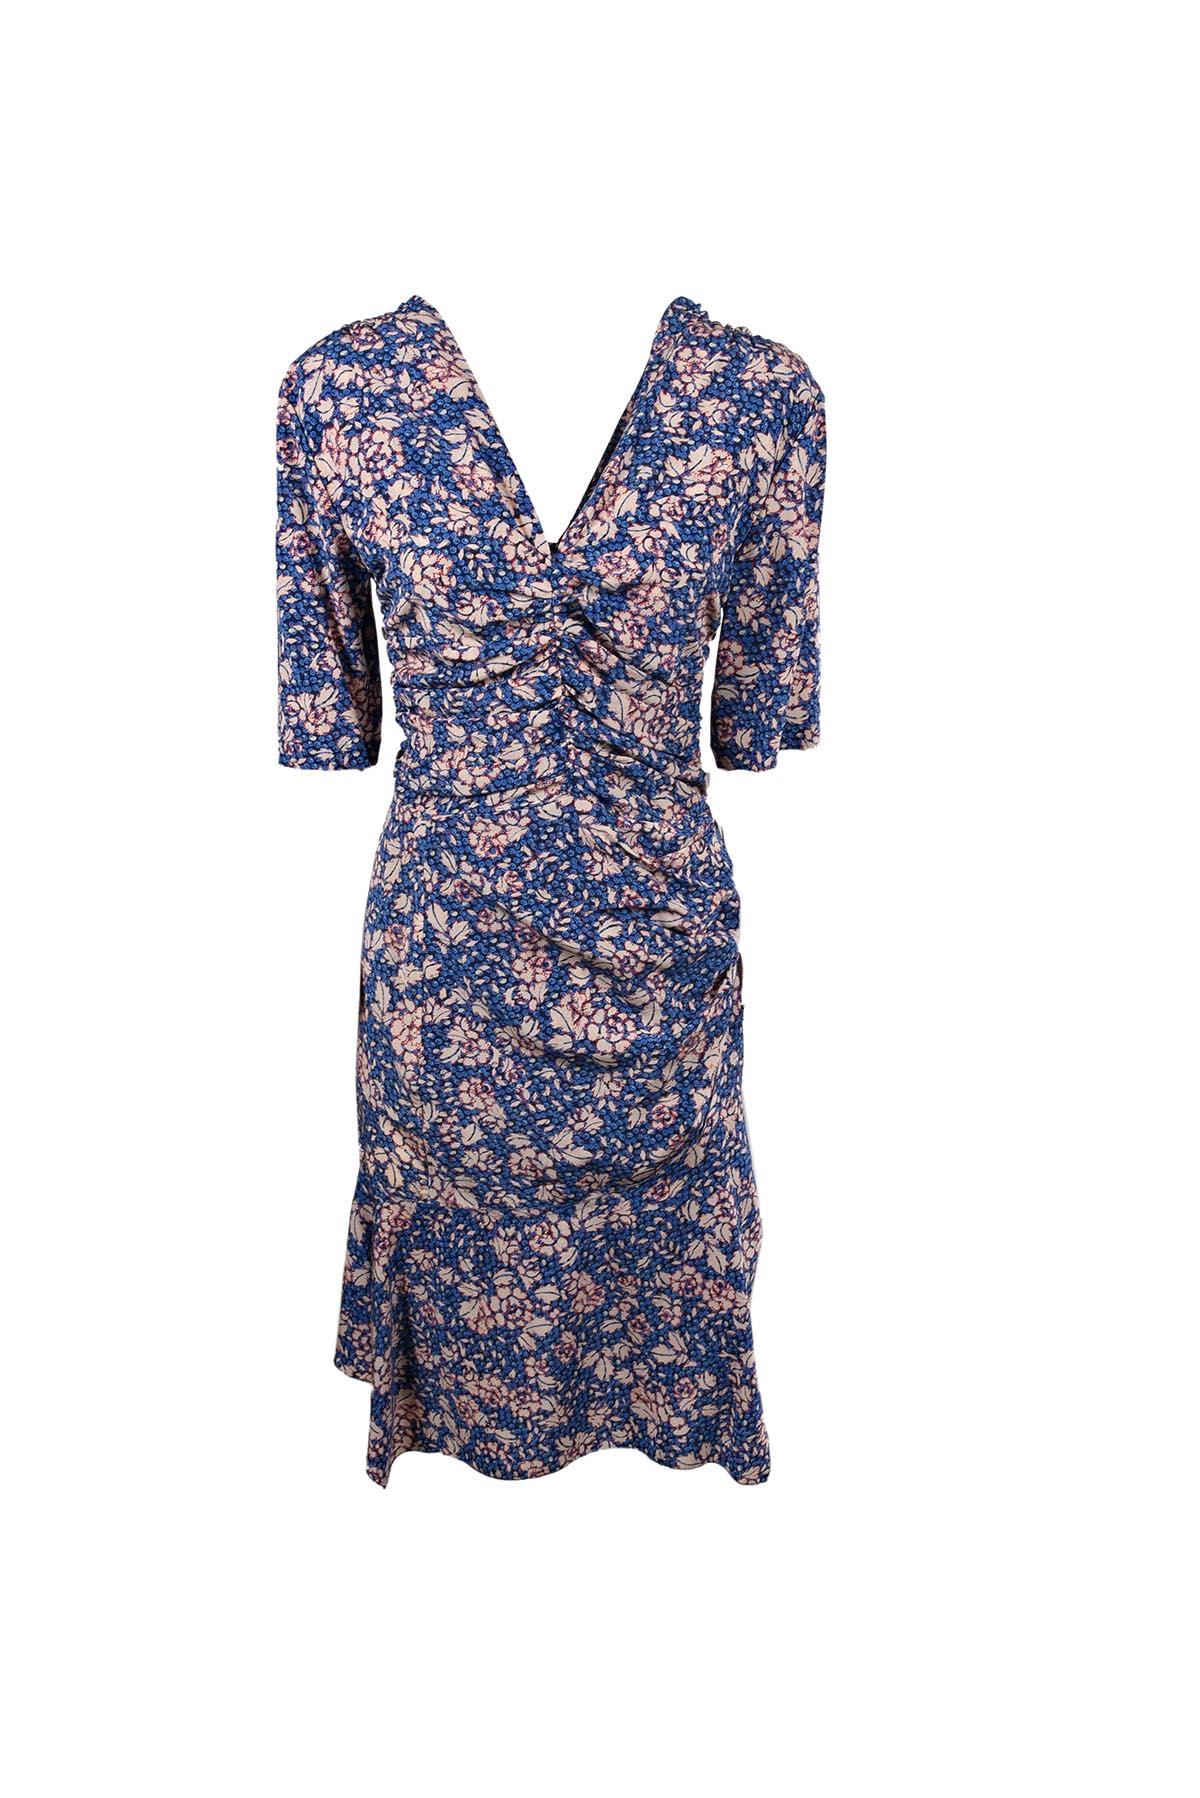 Isabel Marant Brodie Dress